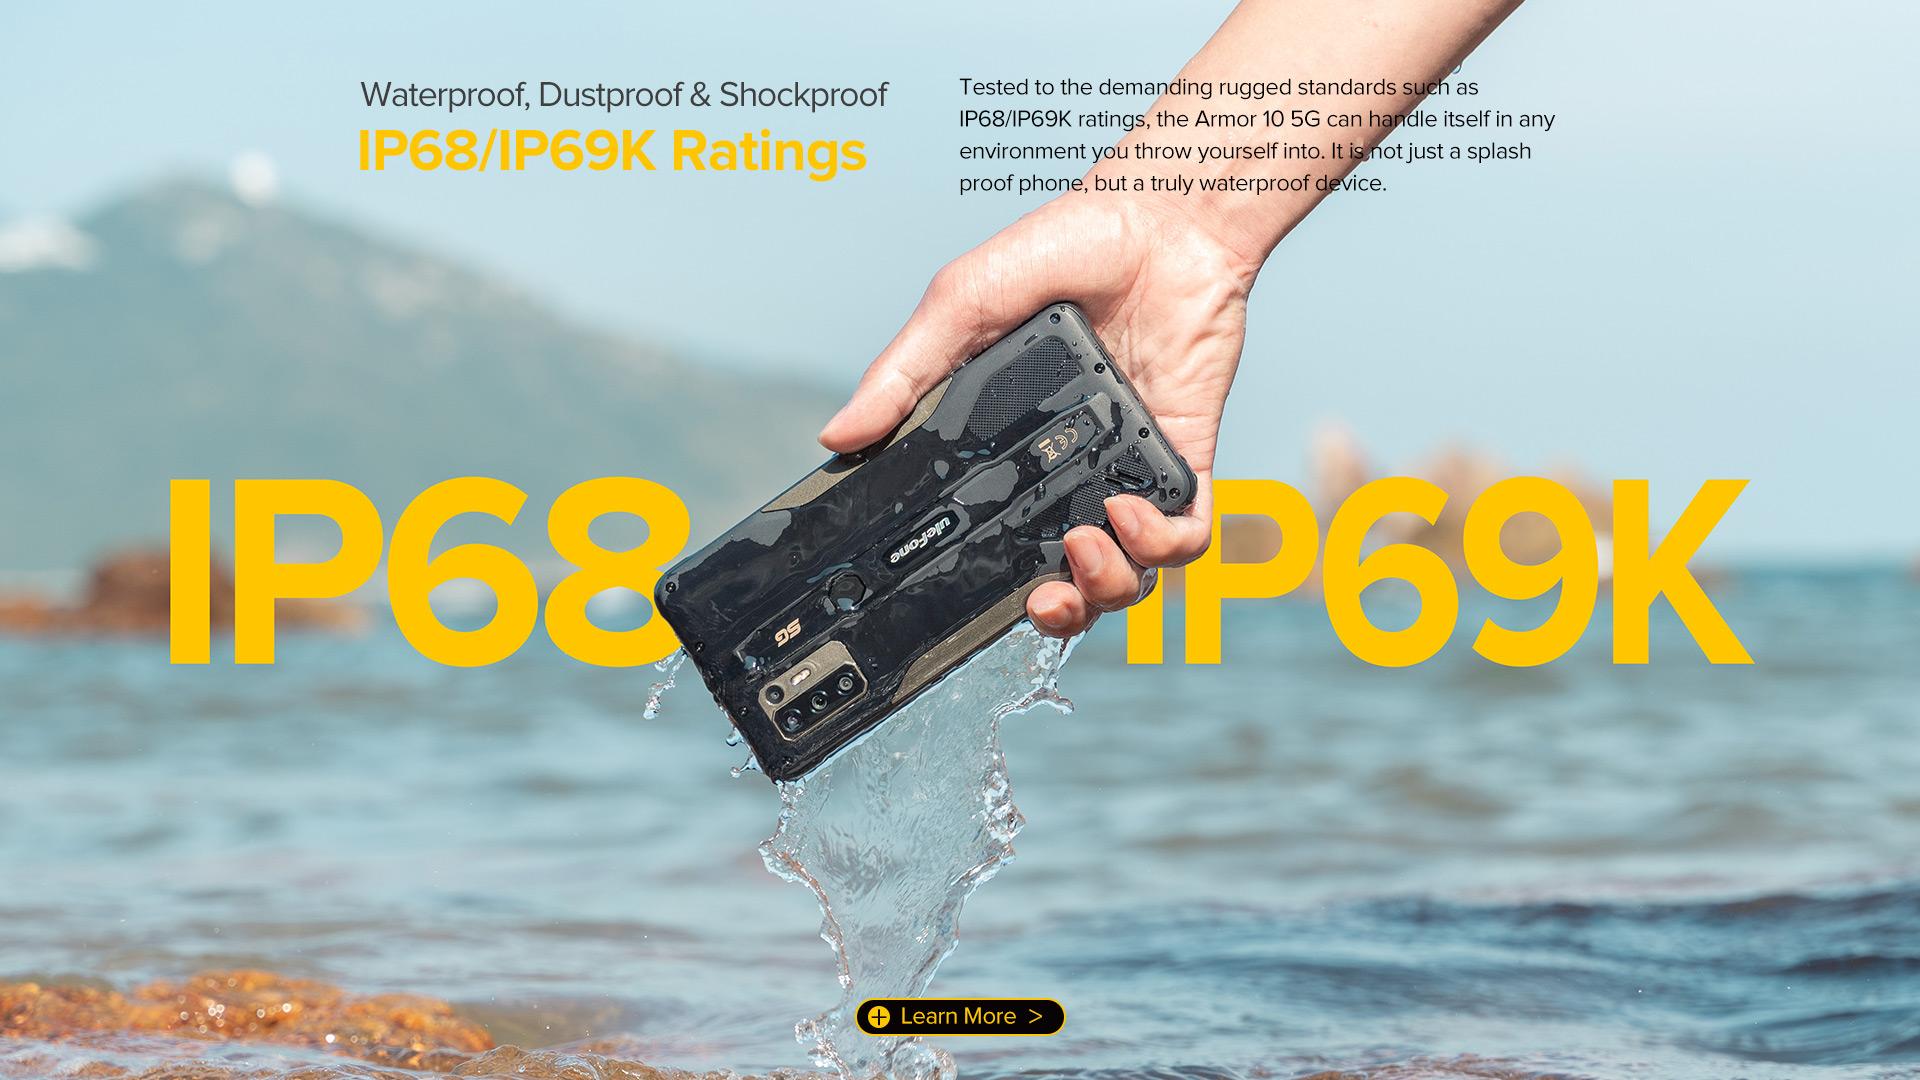 Ulefone Armor 10 5G Rugged Smartphone